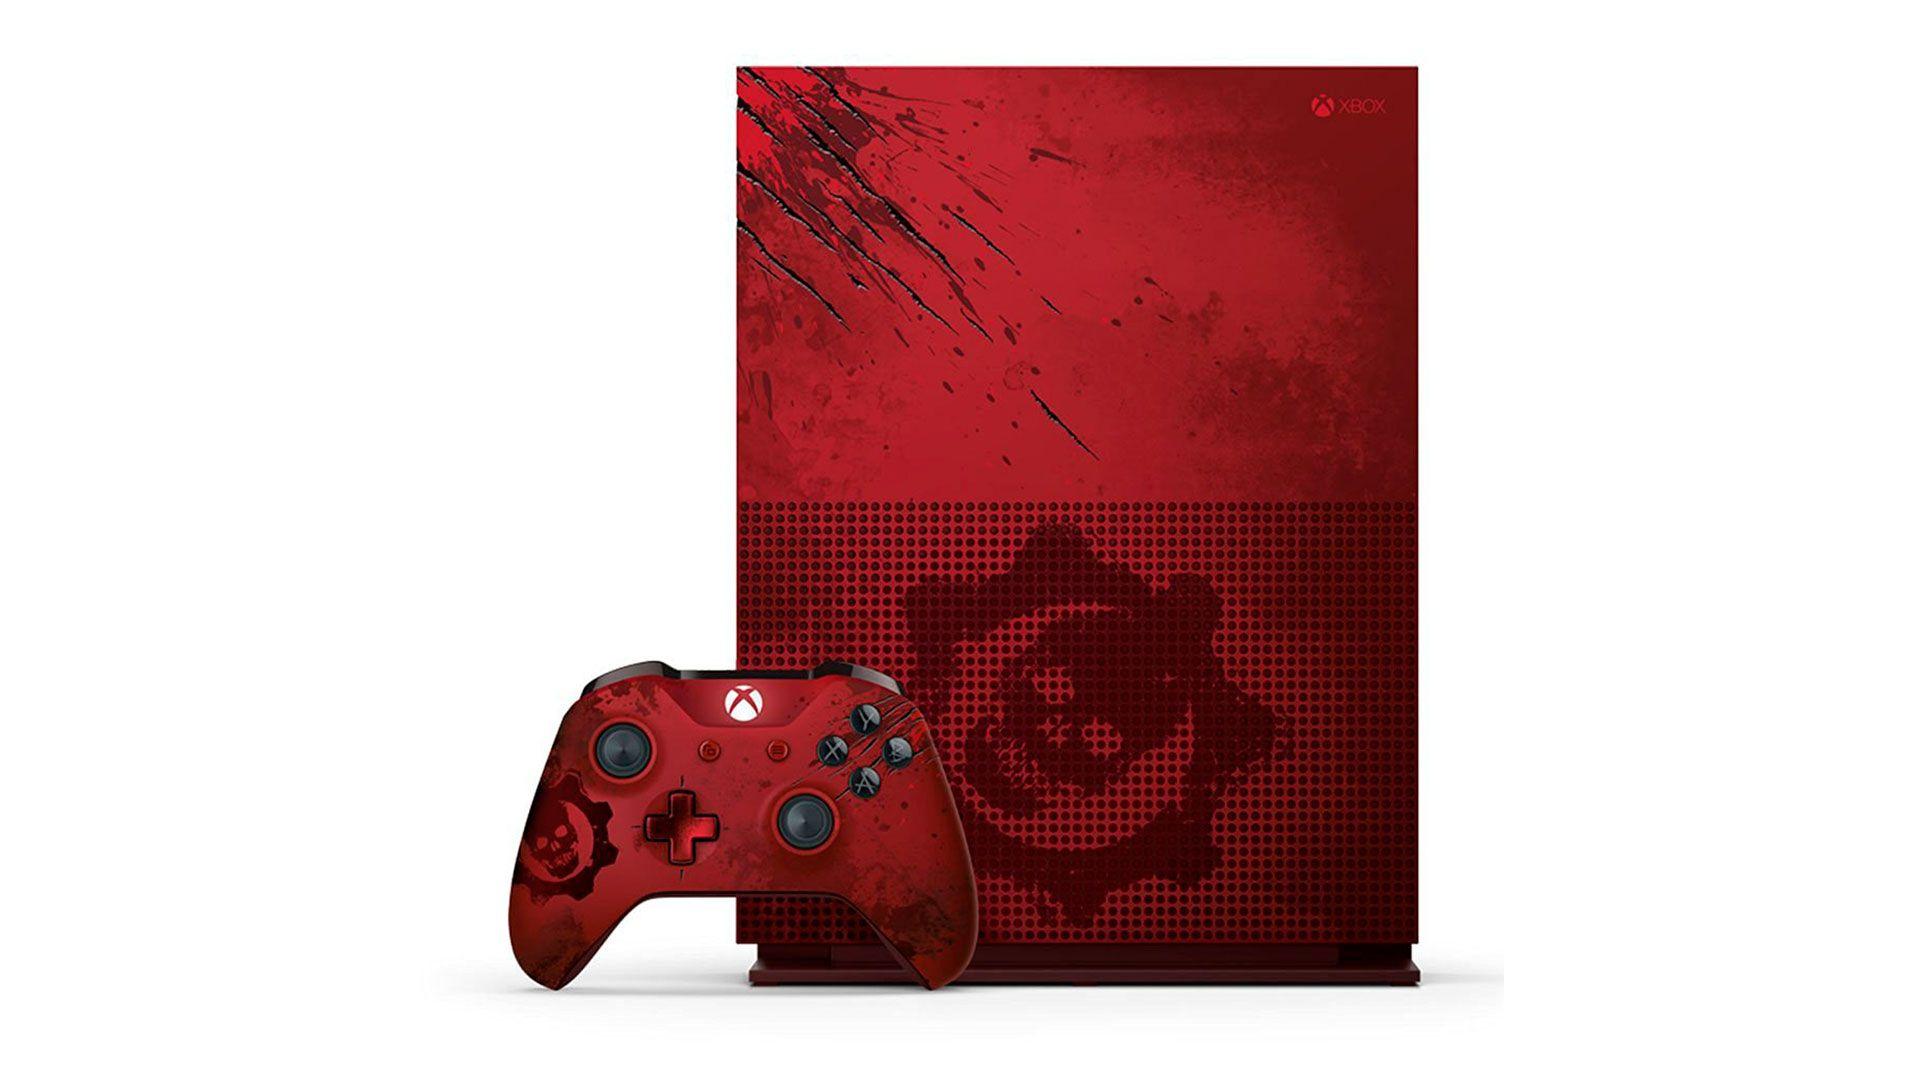 Xbox One S 2Tb Gears of War 4 изображение 1